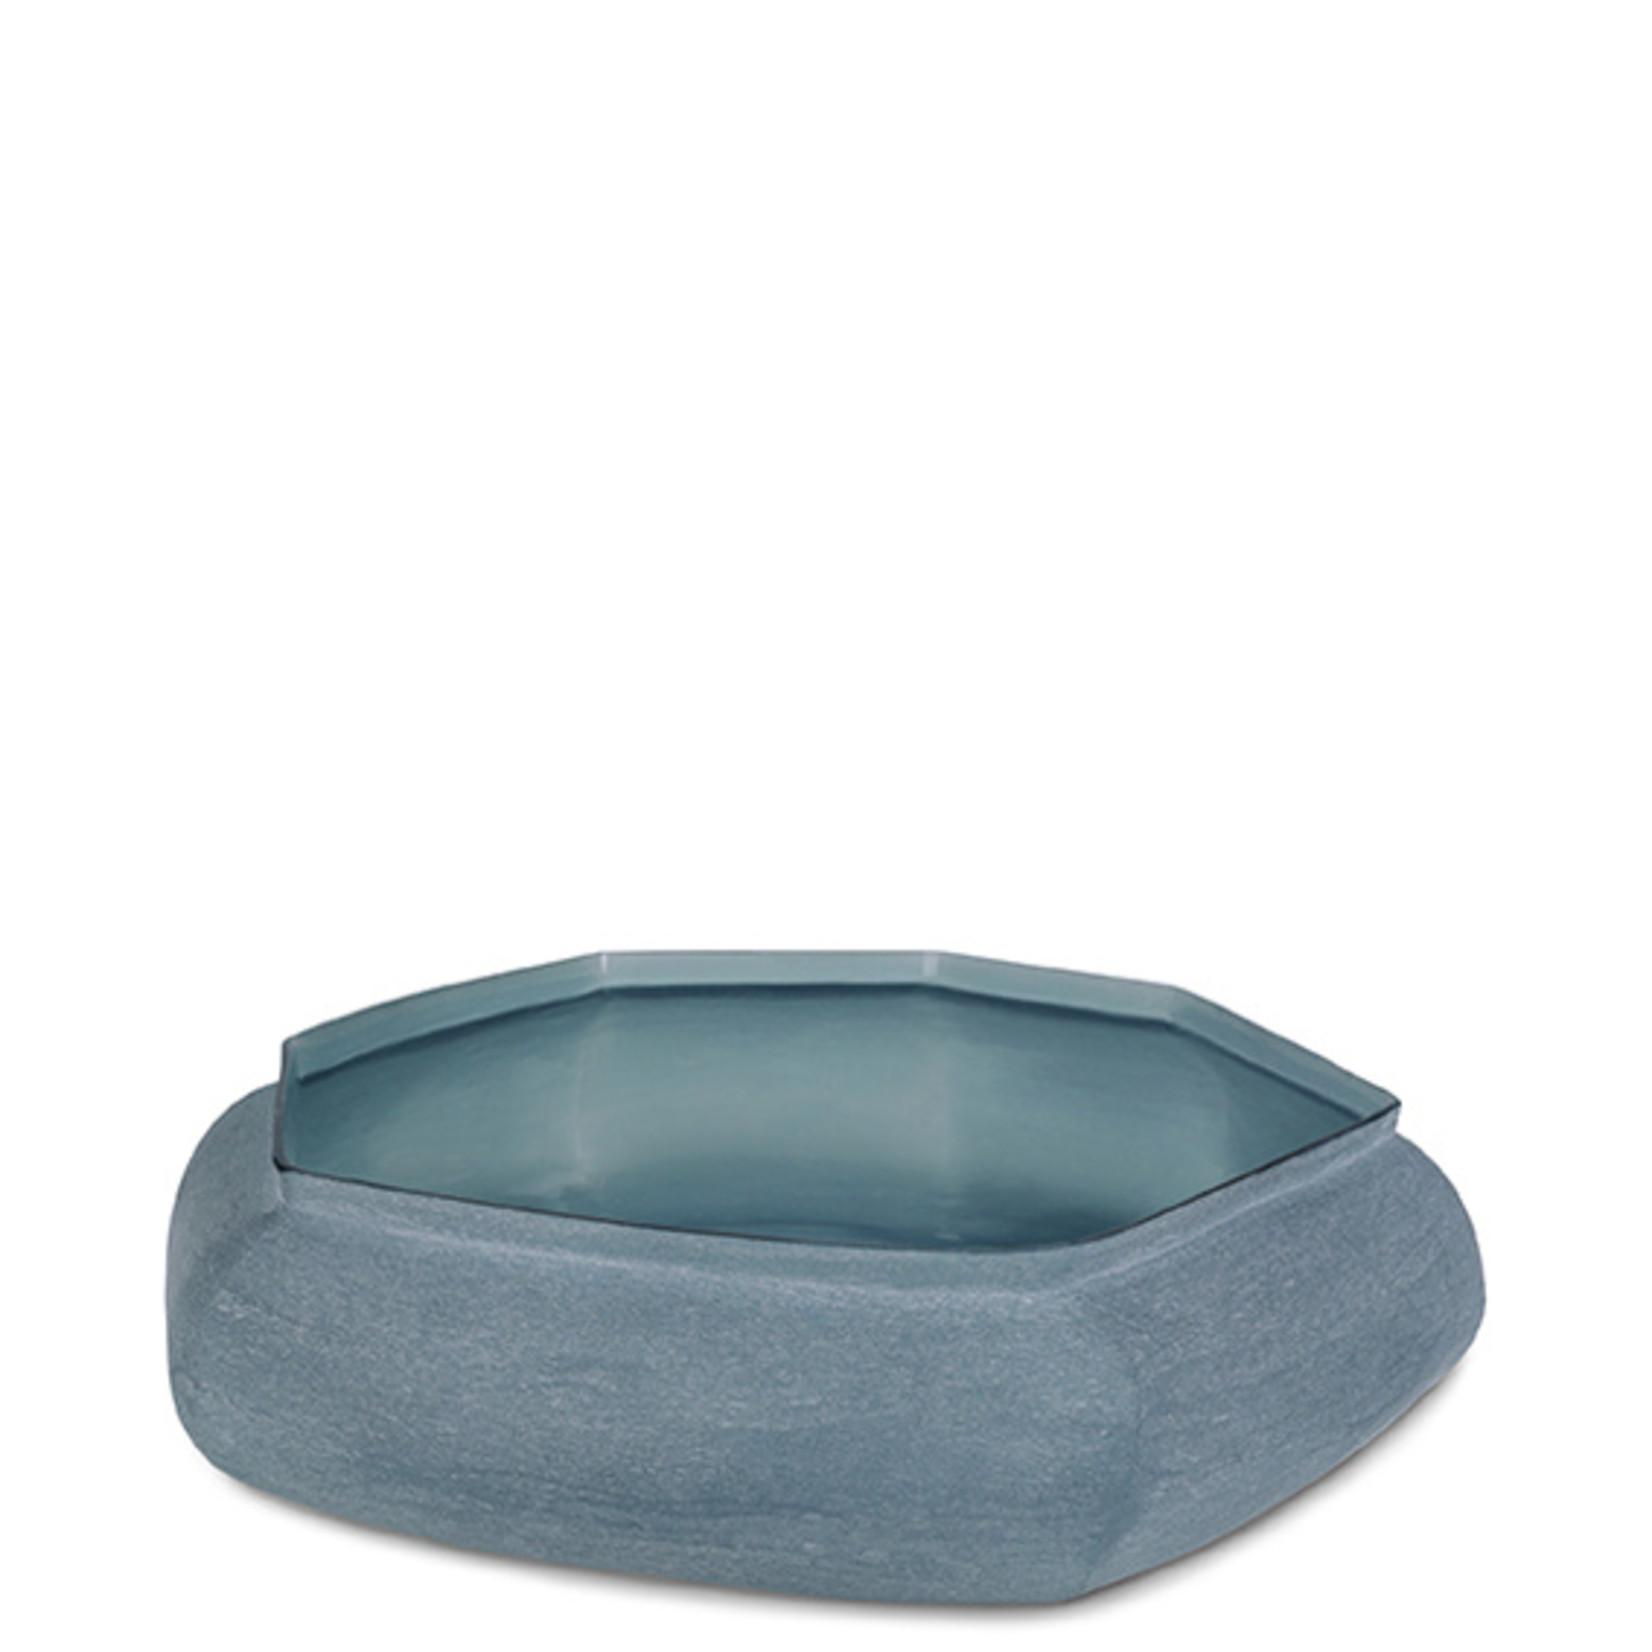 Guaxs Bowl Karakol | Indigo